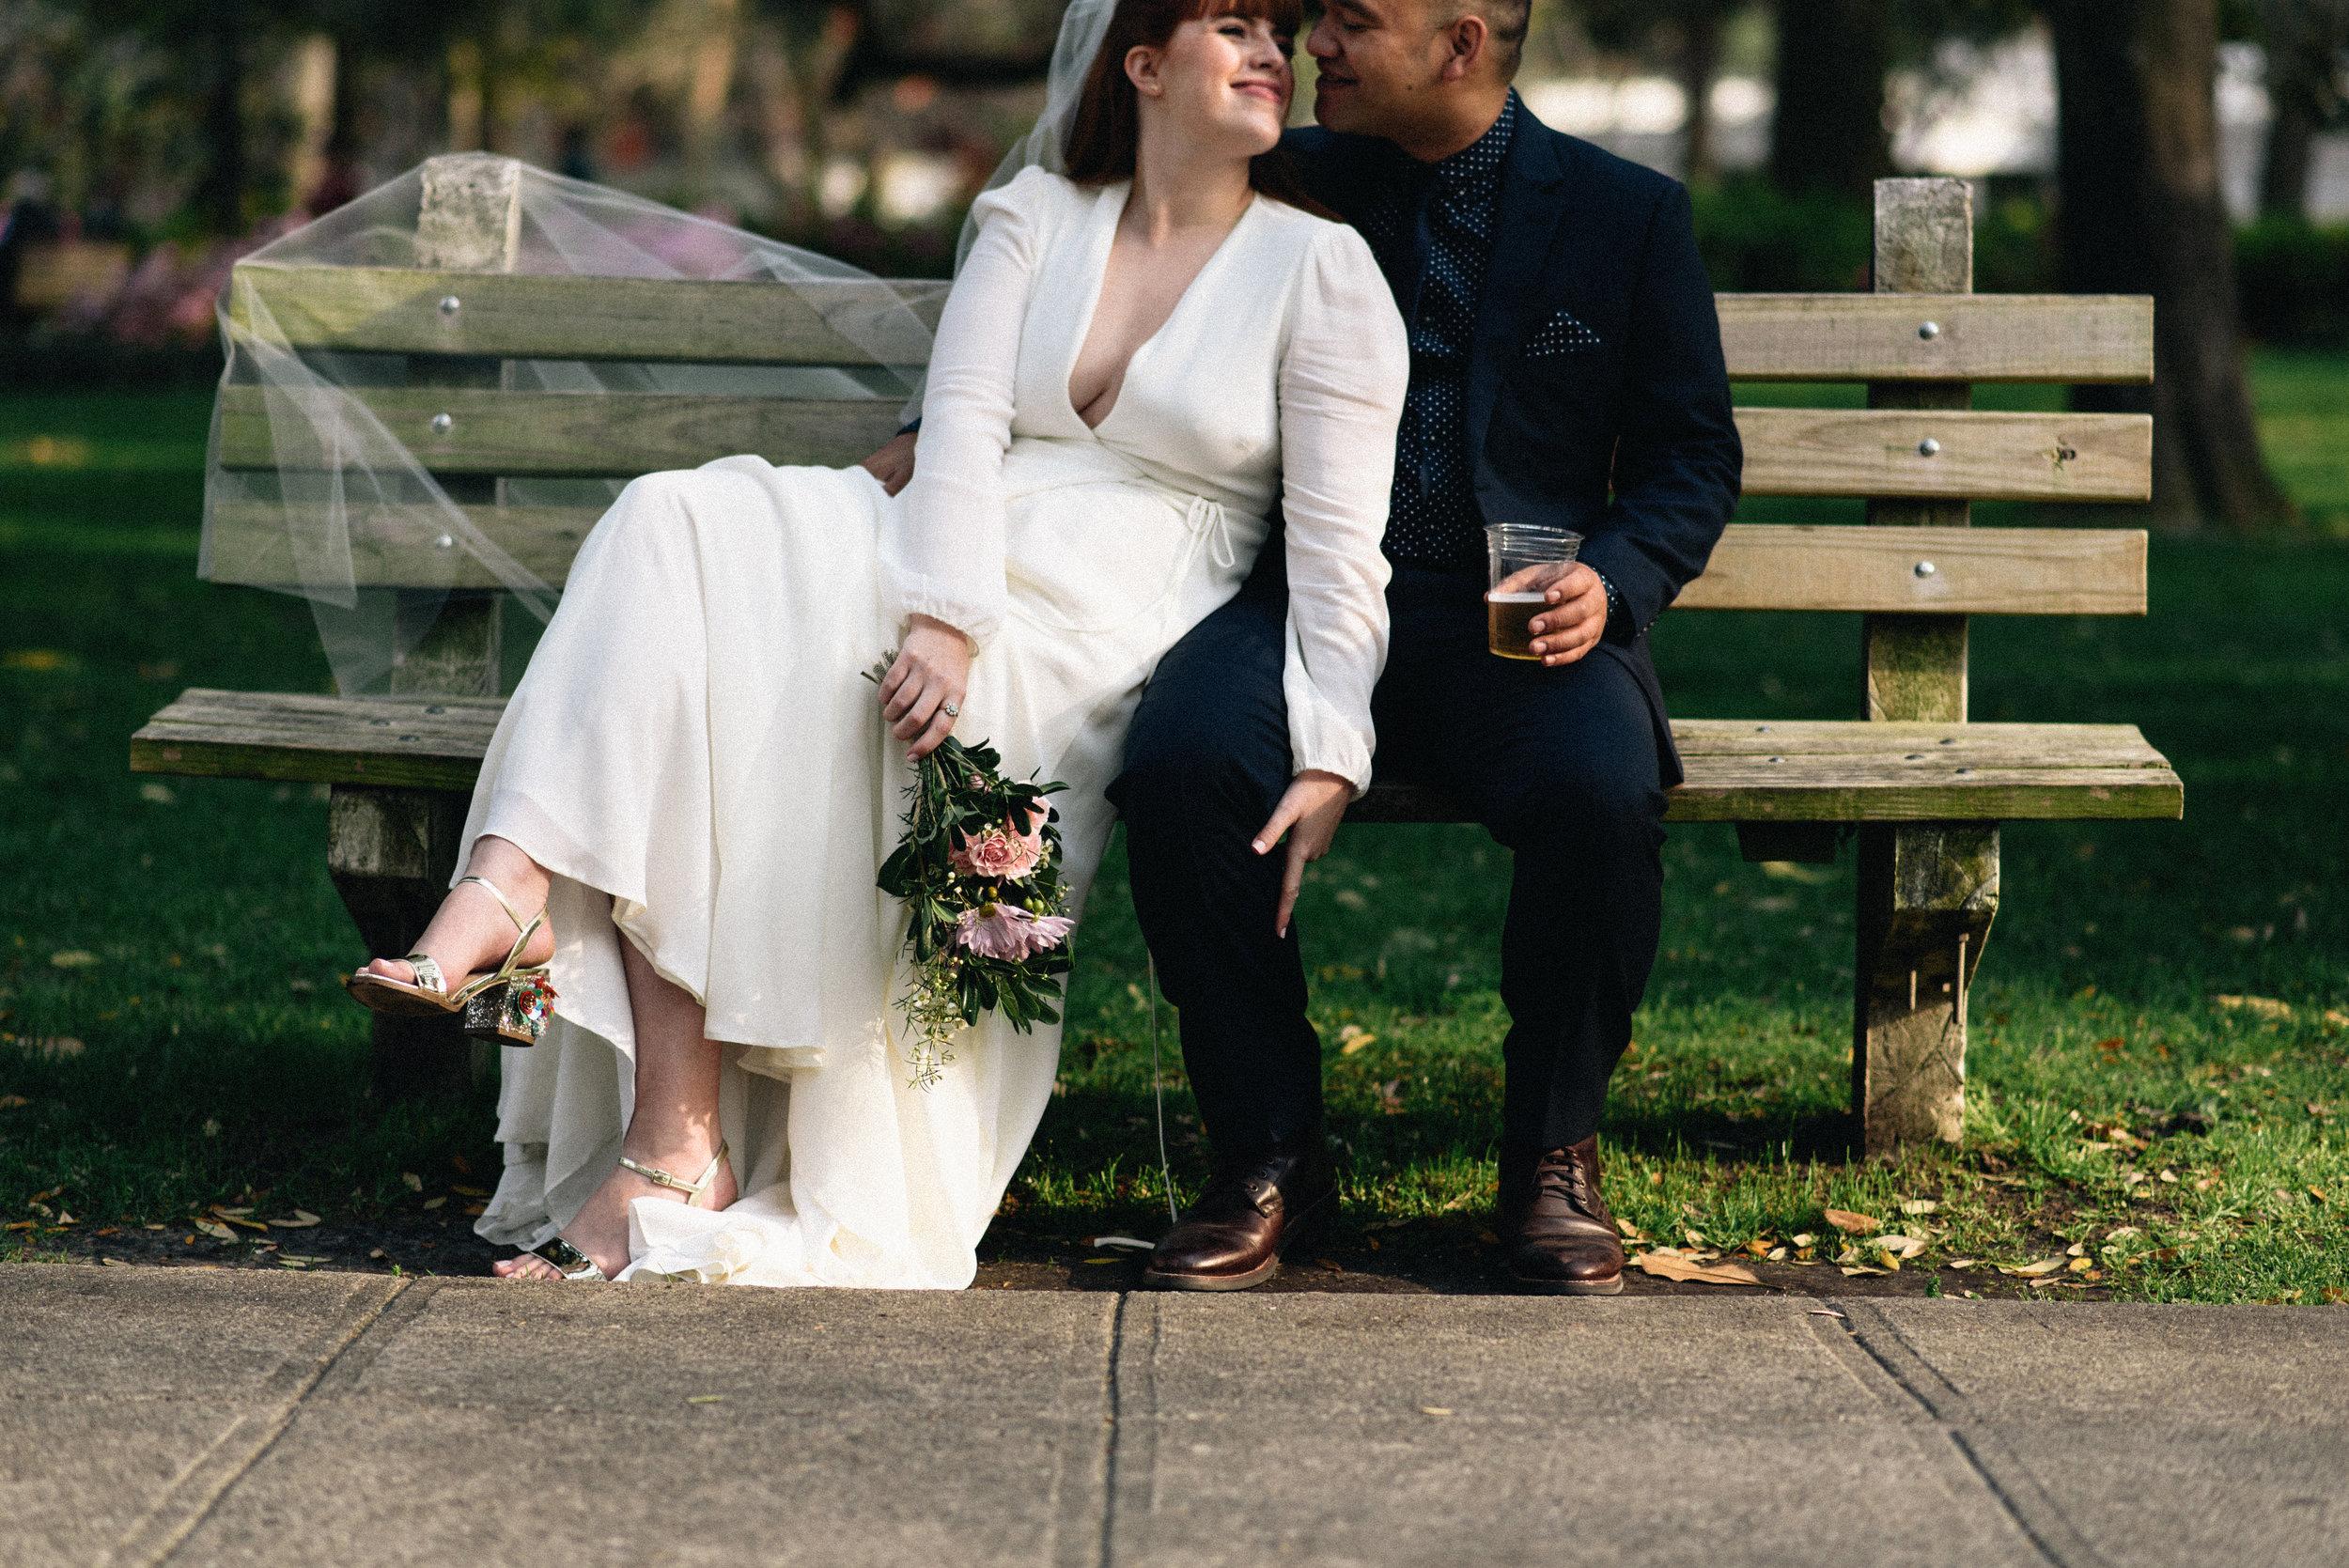 savannah-elopement-photography-savannah-georgia-elopement-photographer-savannah-wedding-photographer-meg-hill-photo-jade-hill- (35 of 58).jpg